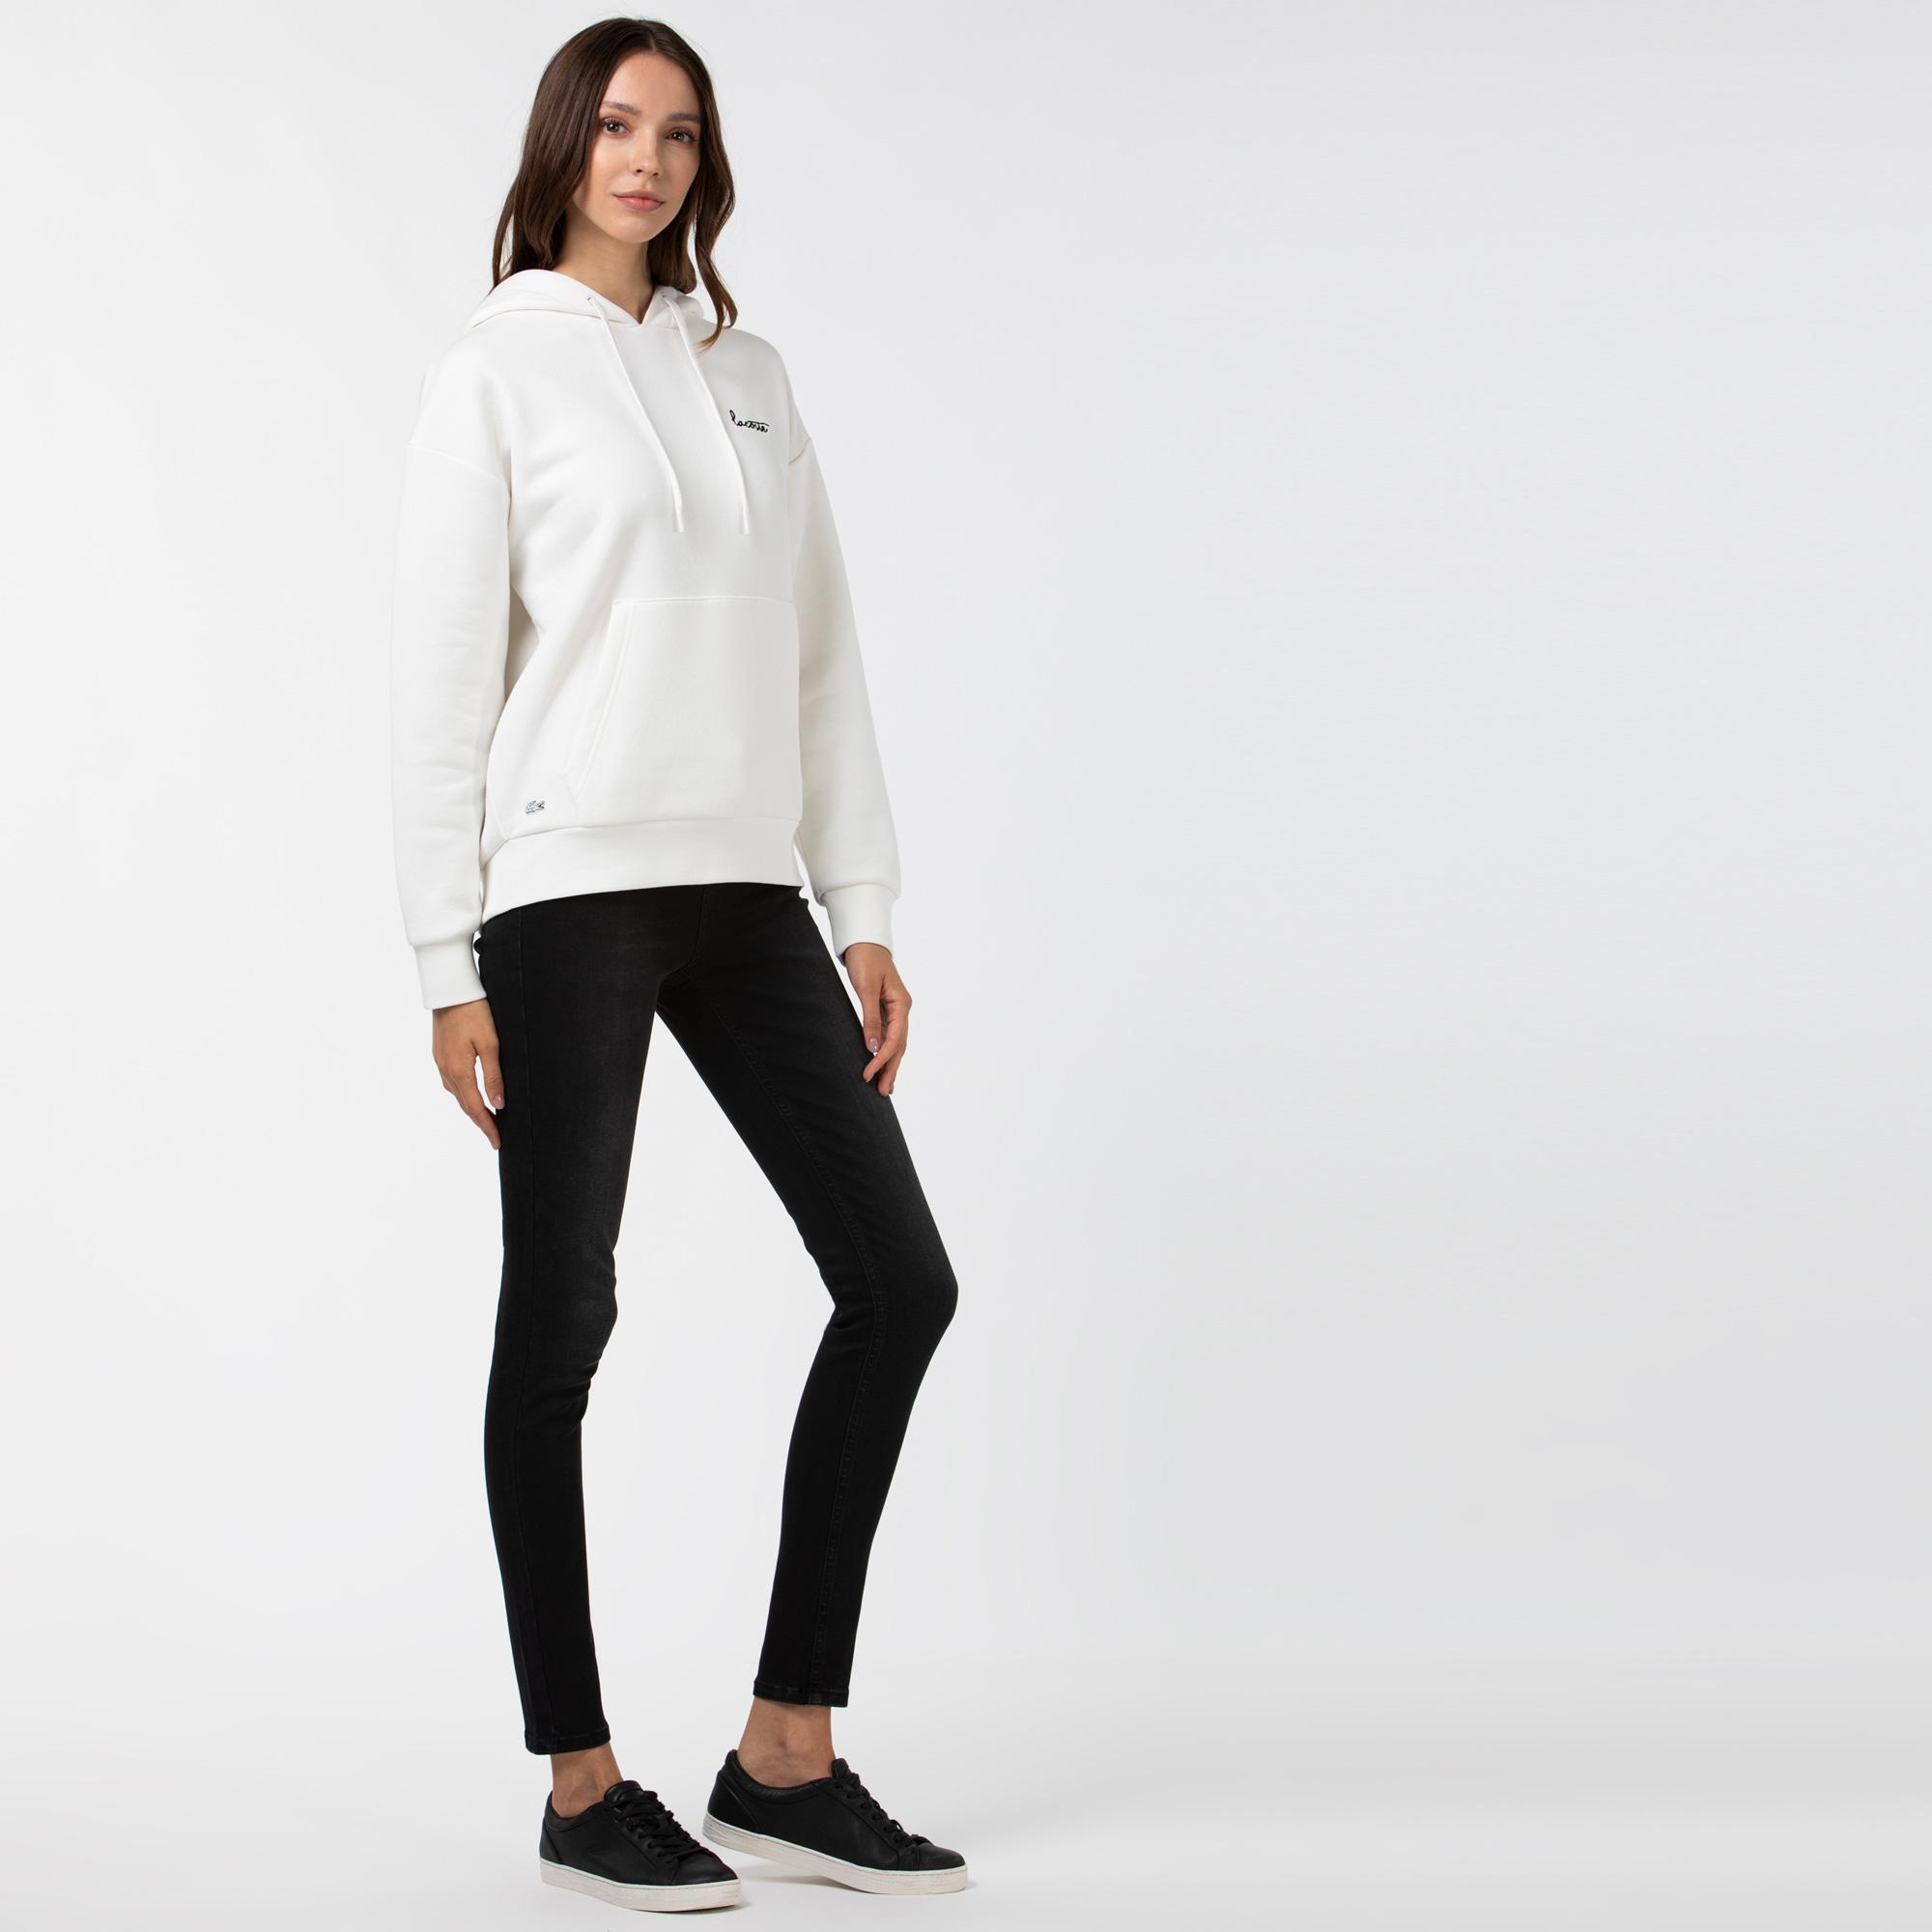 Lacoste Kadın Slim Fit Denim Gri Pantolon